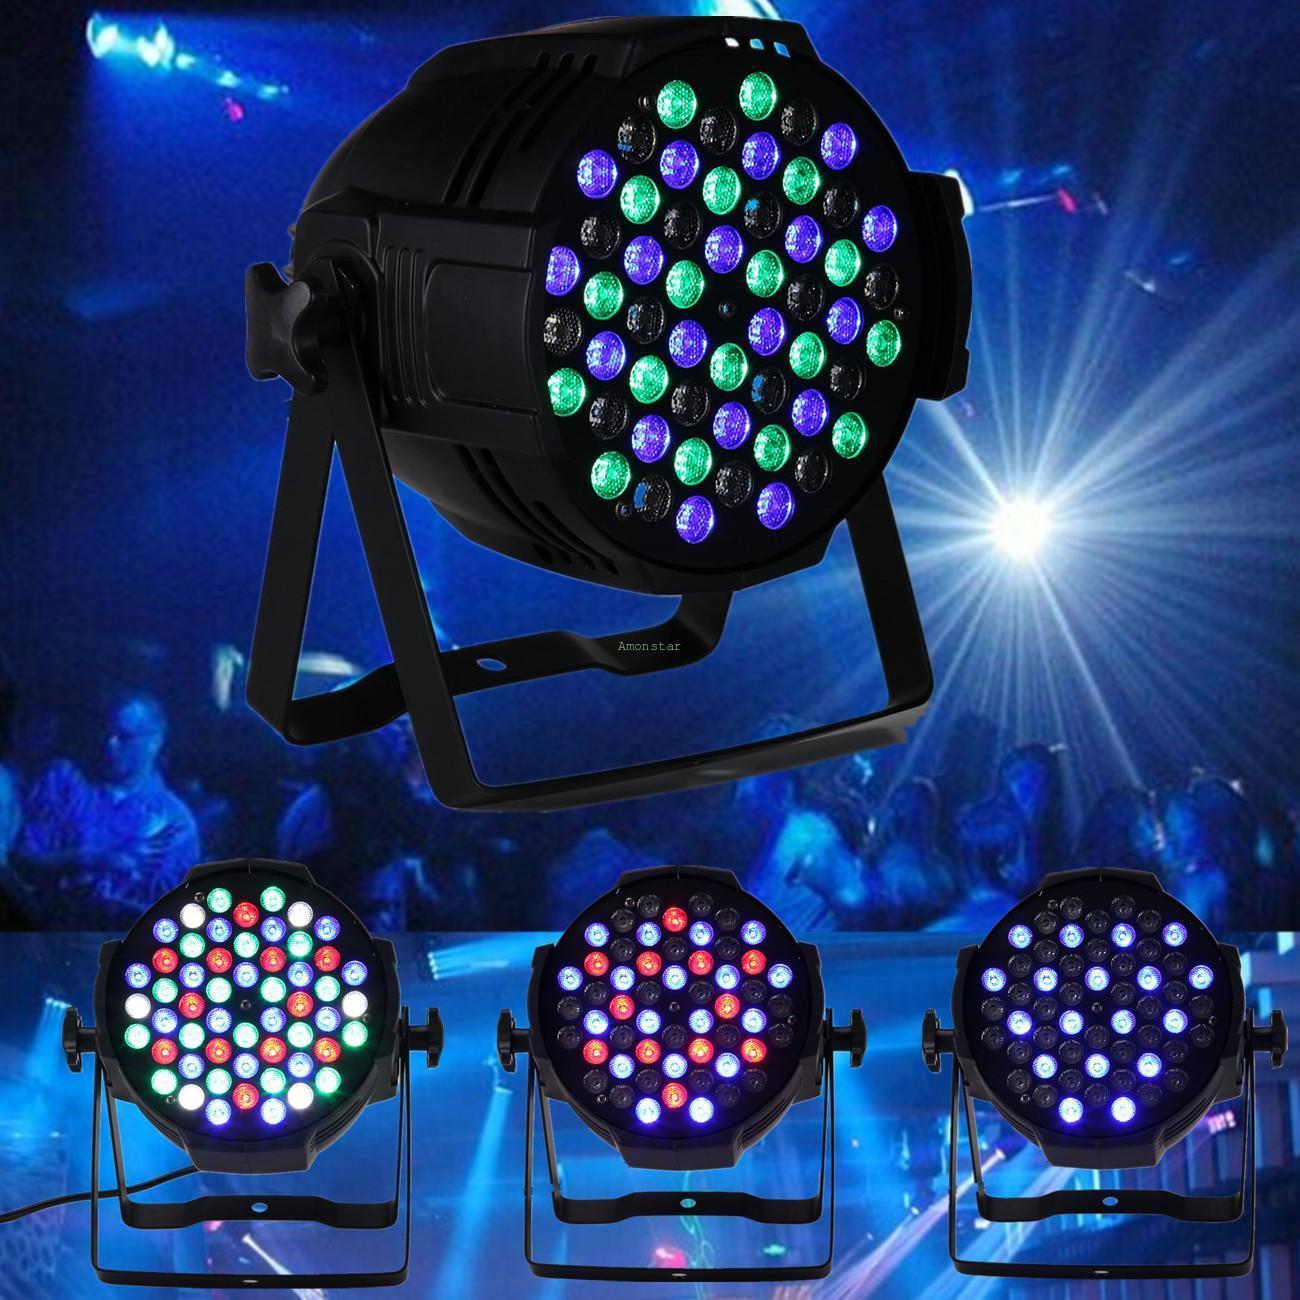 dj bar disco par64 54x3w led stage lighting rgbw dmx 512 party club strobe lamp ebay. Black Bedroom Furniture Sets. Home Design Ideas